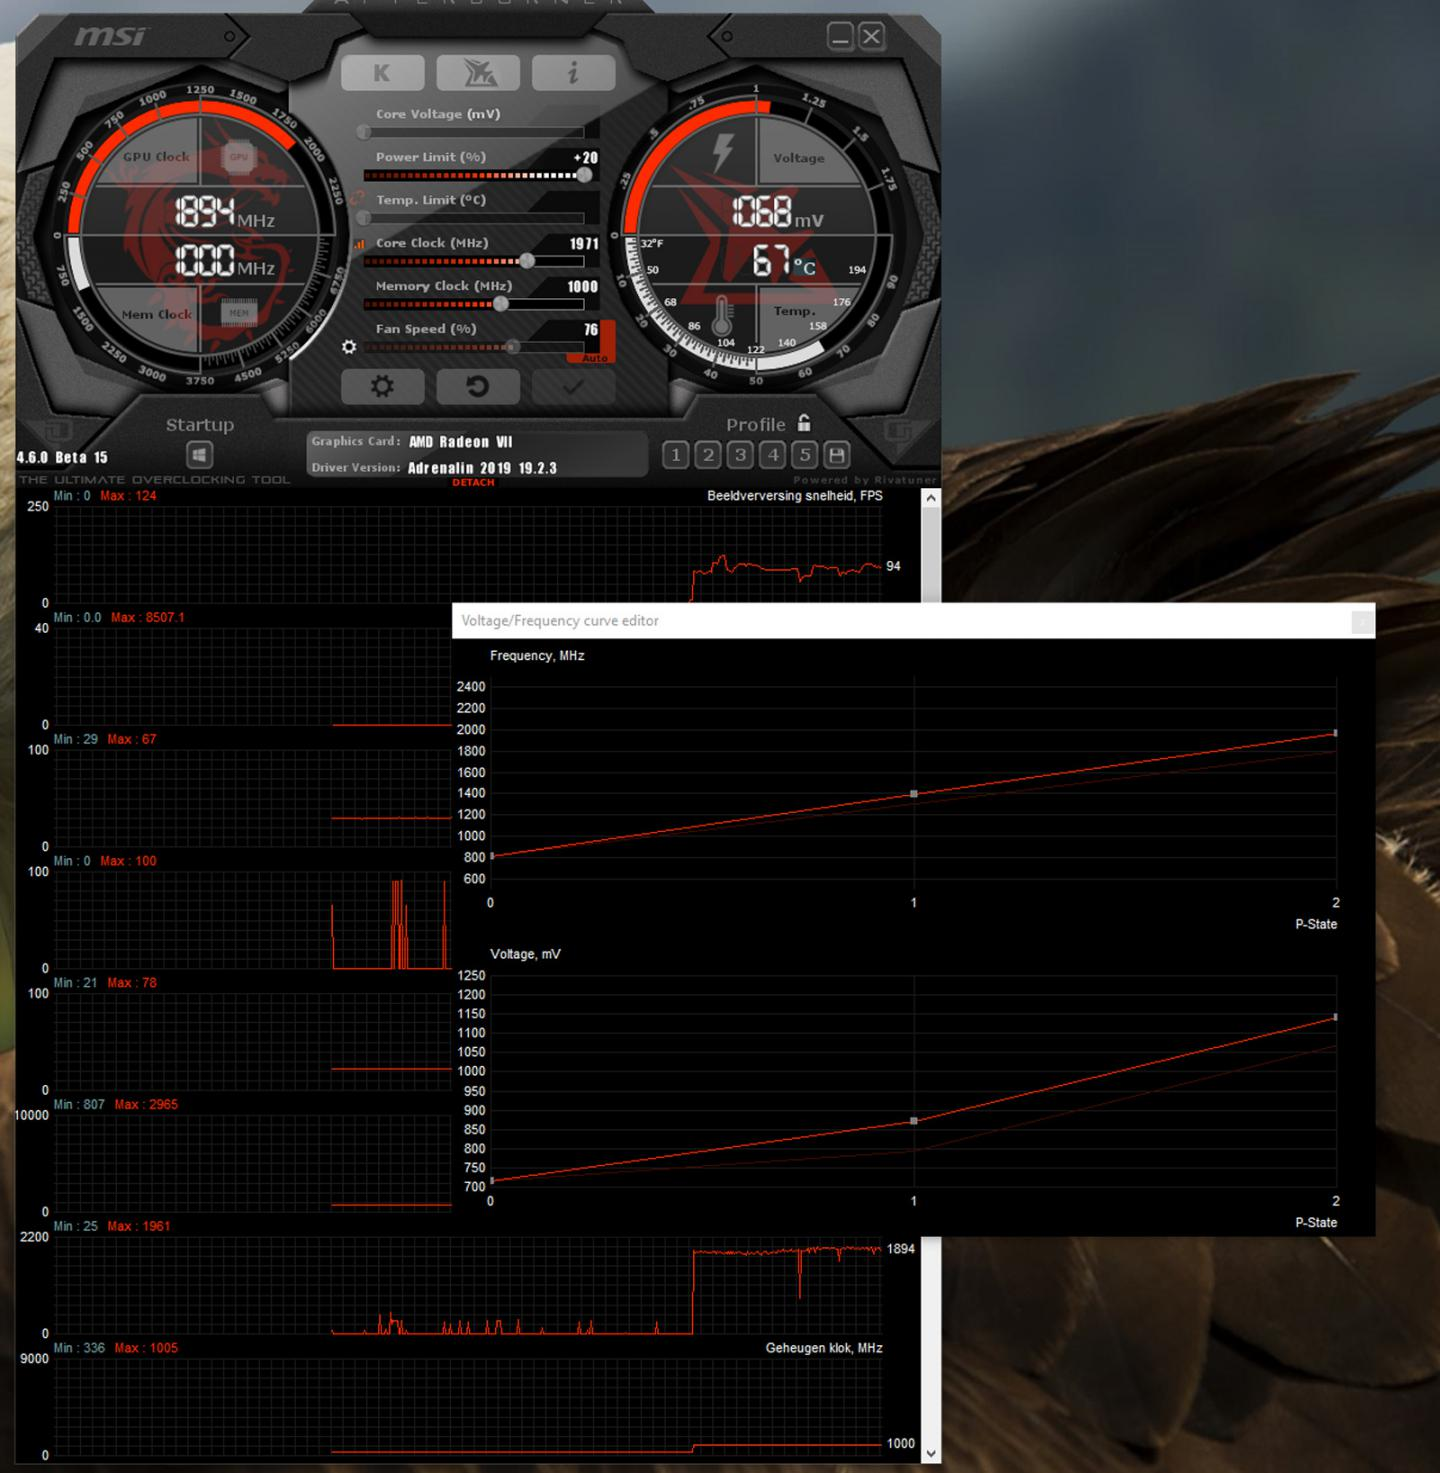 Download: Afterburner 4 6 0 Beta 16 build 14806 - more Radeon VII